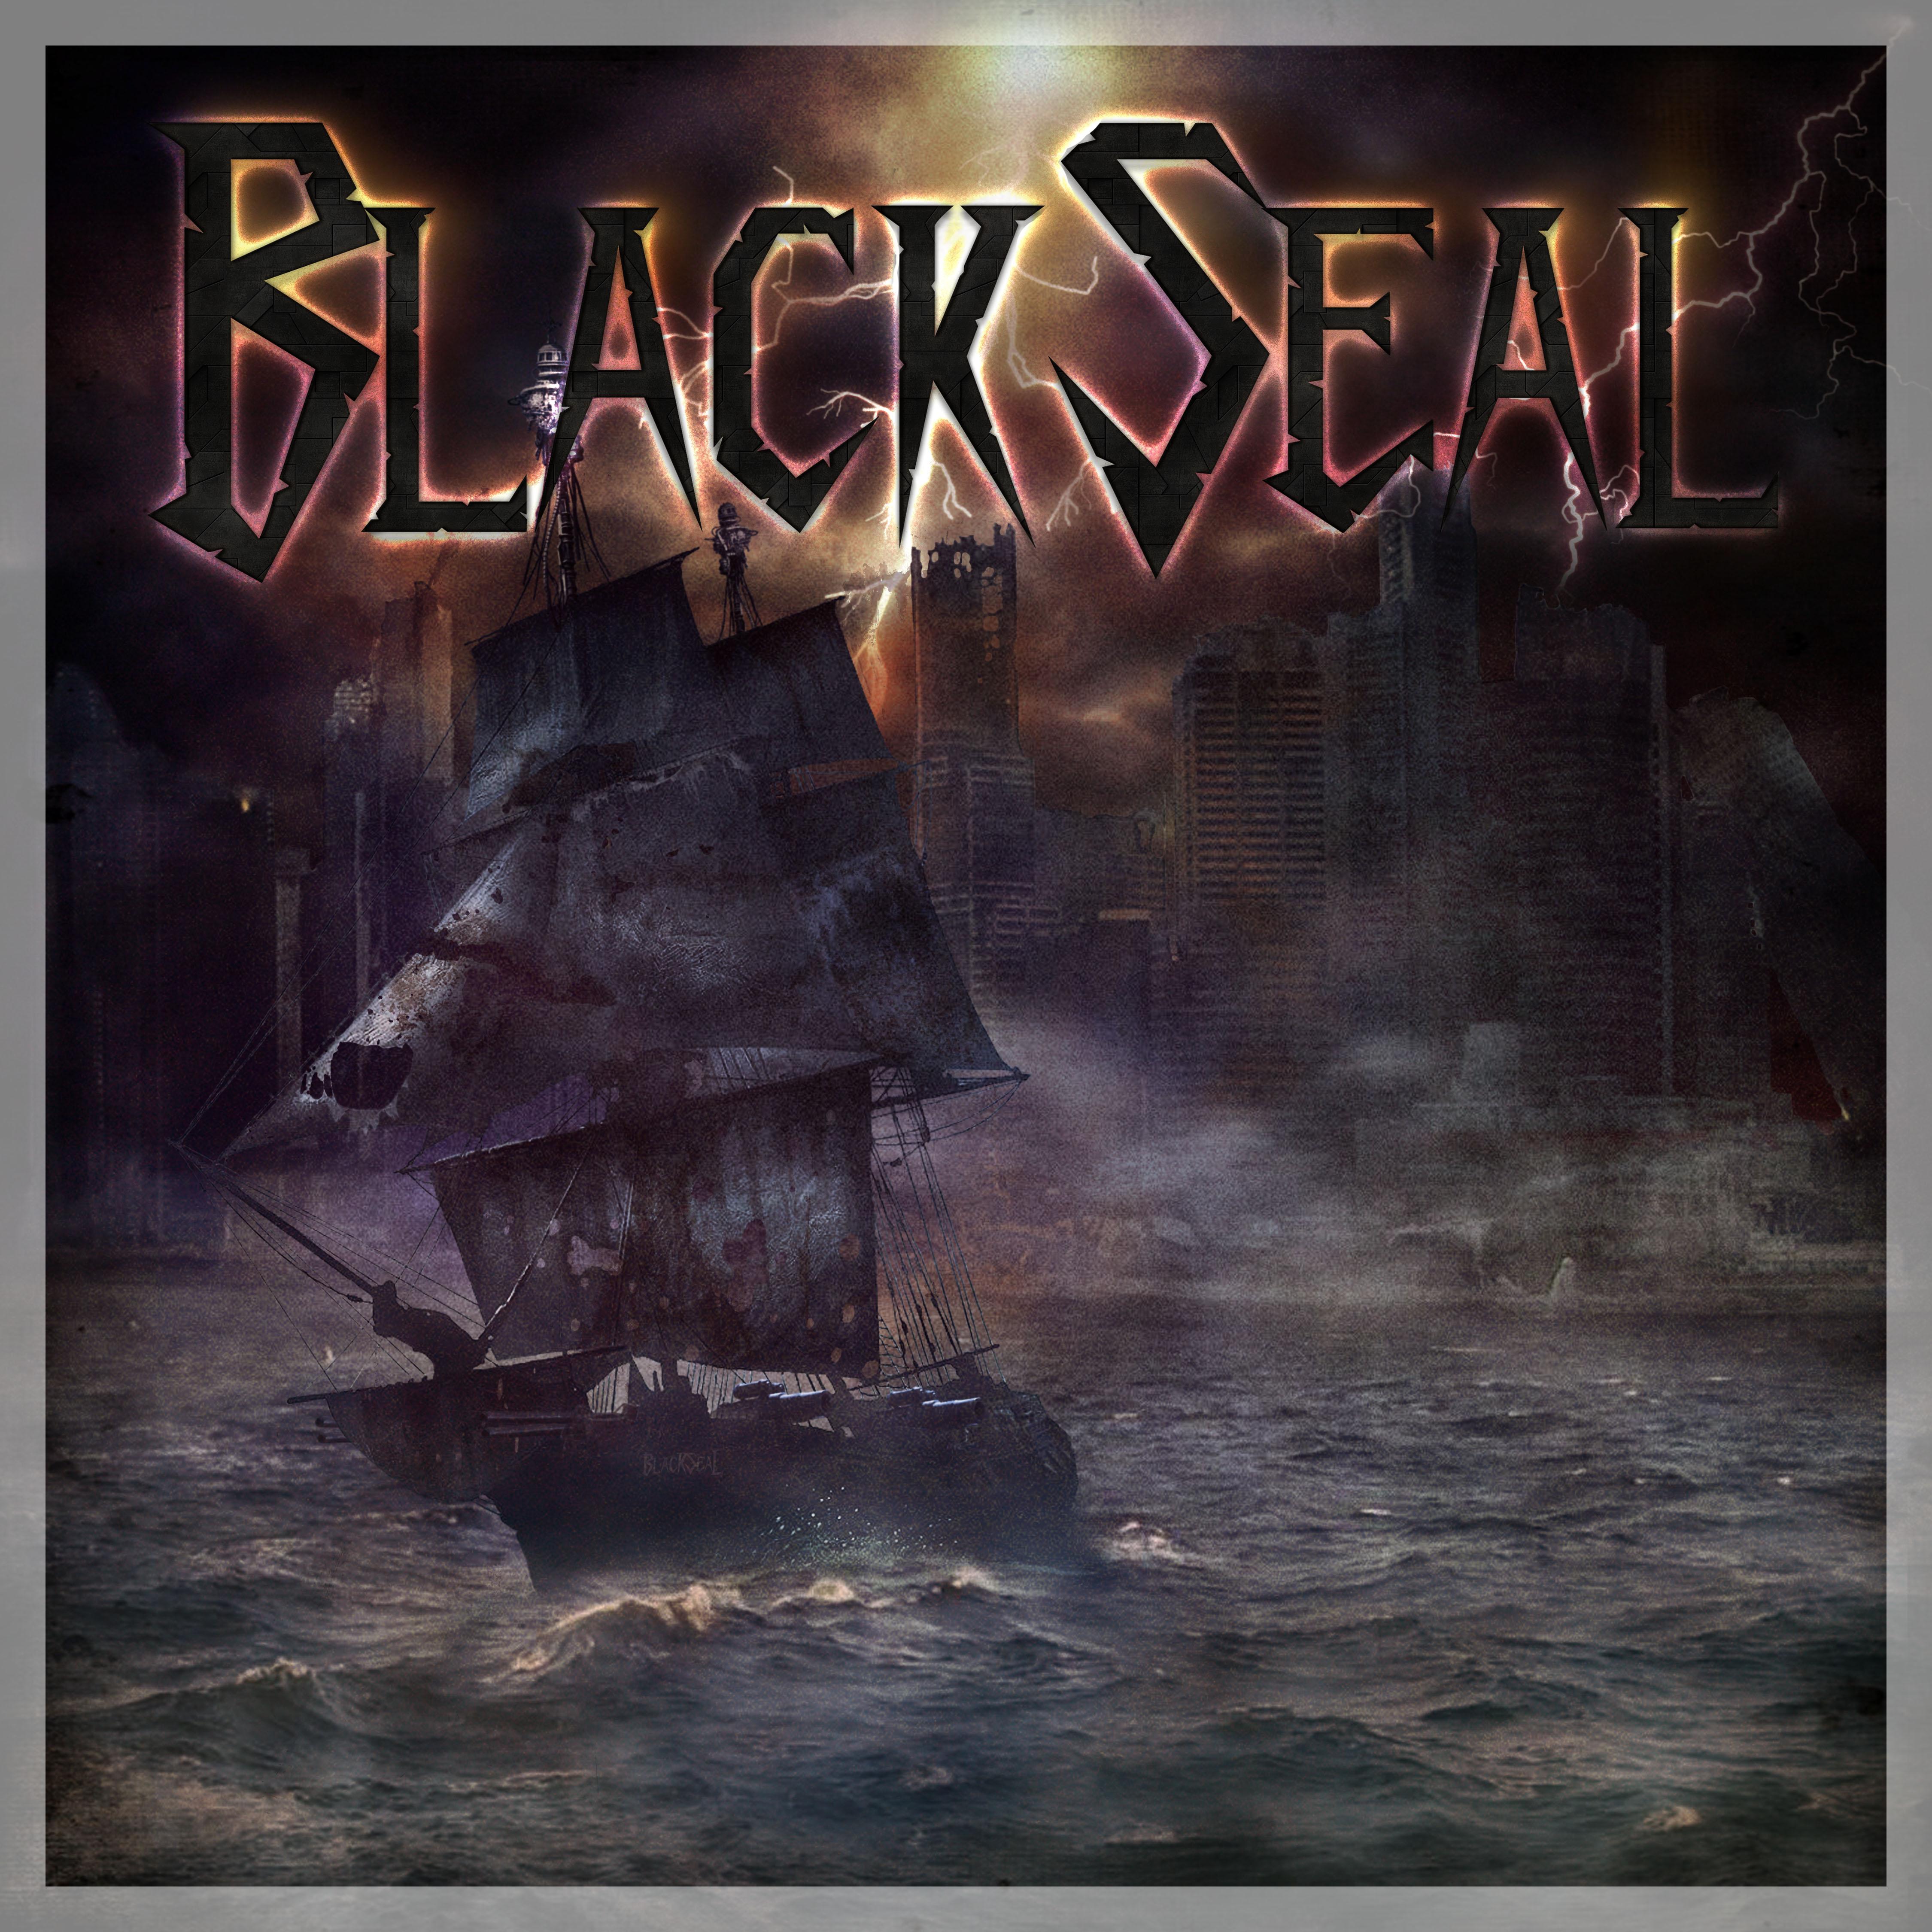 Black Seal - BLACK SEAL